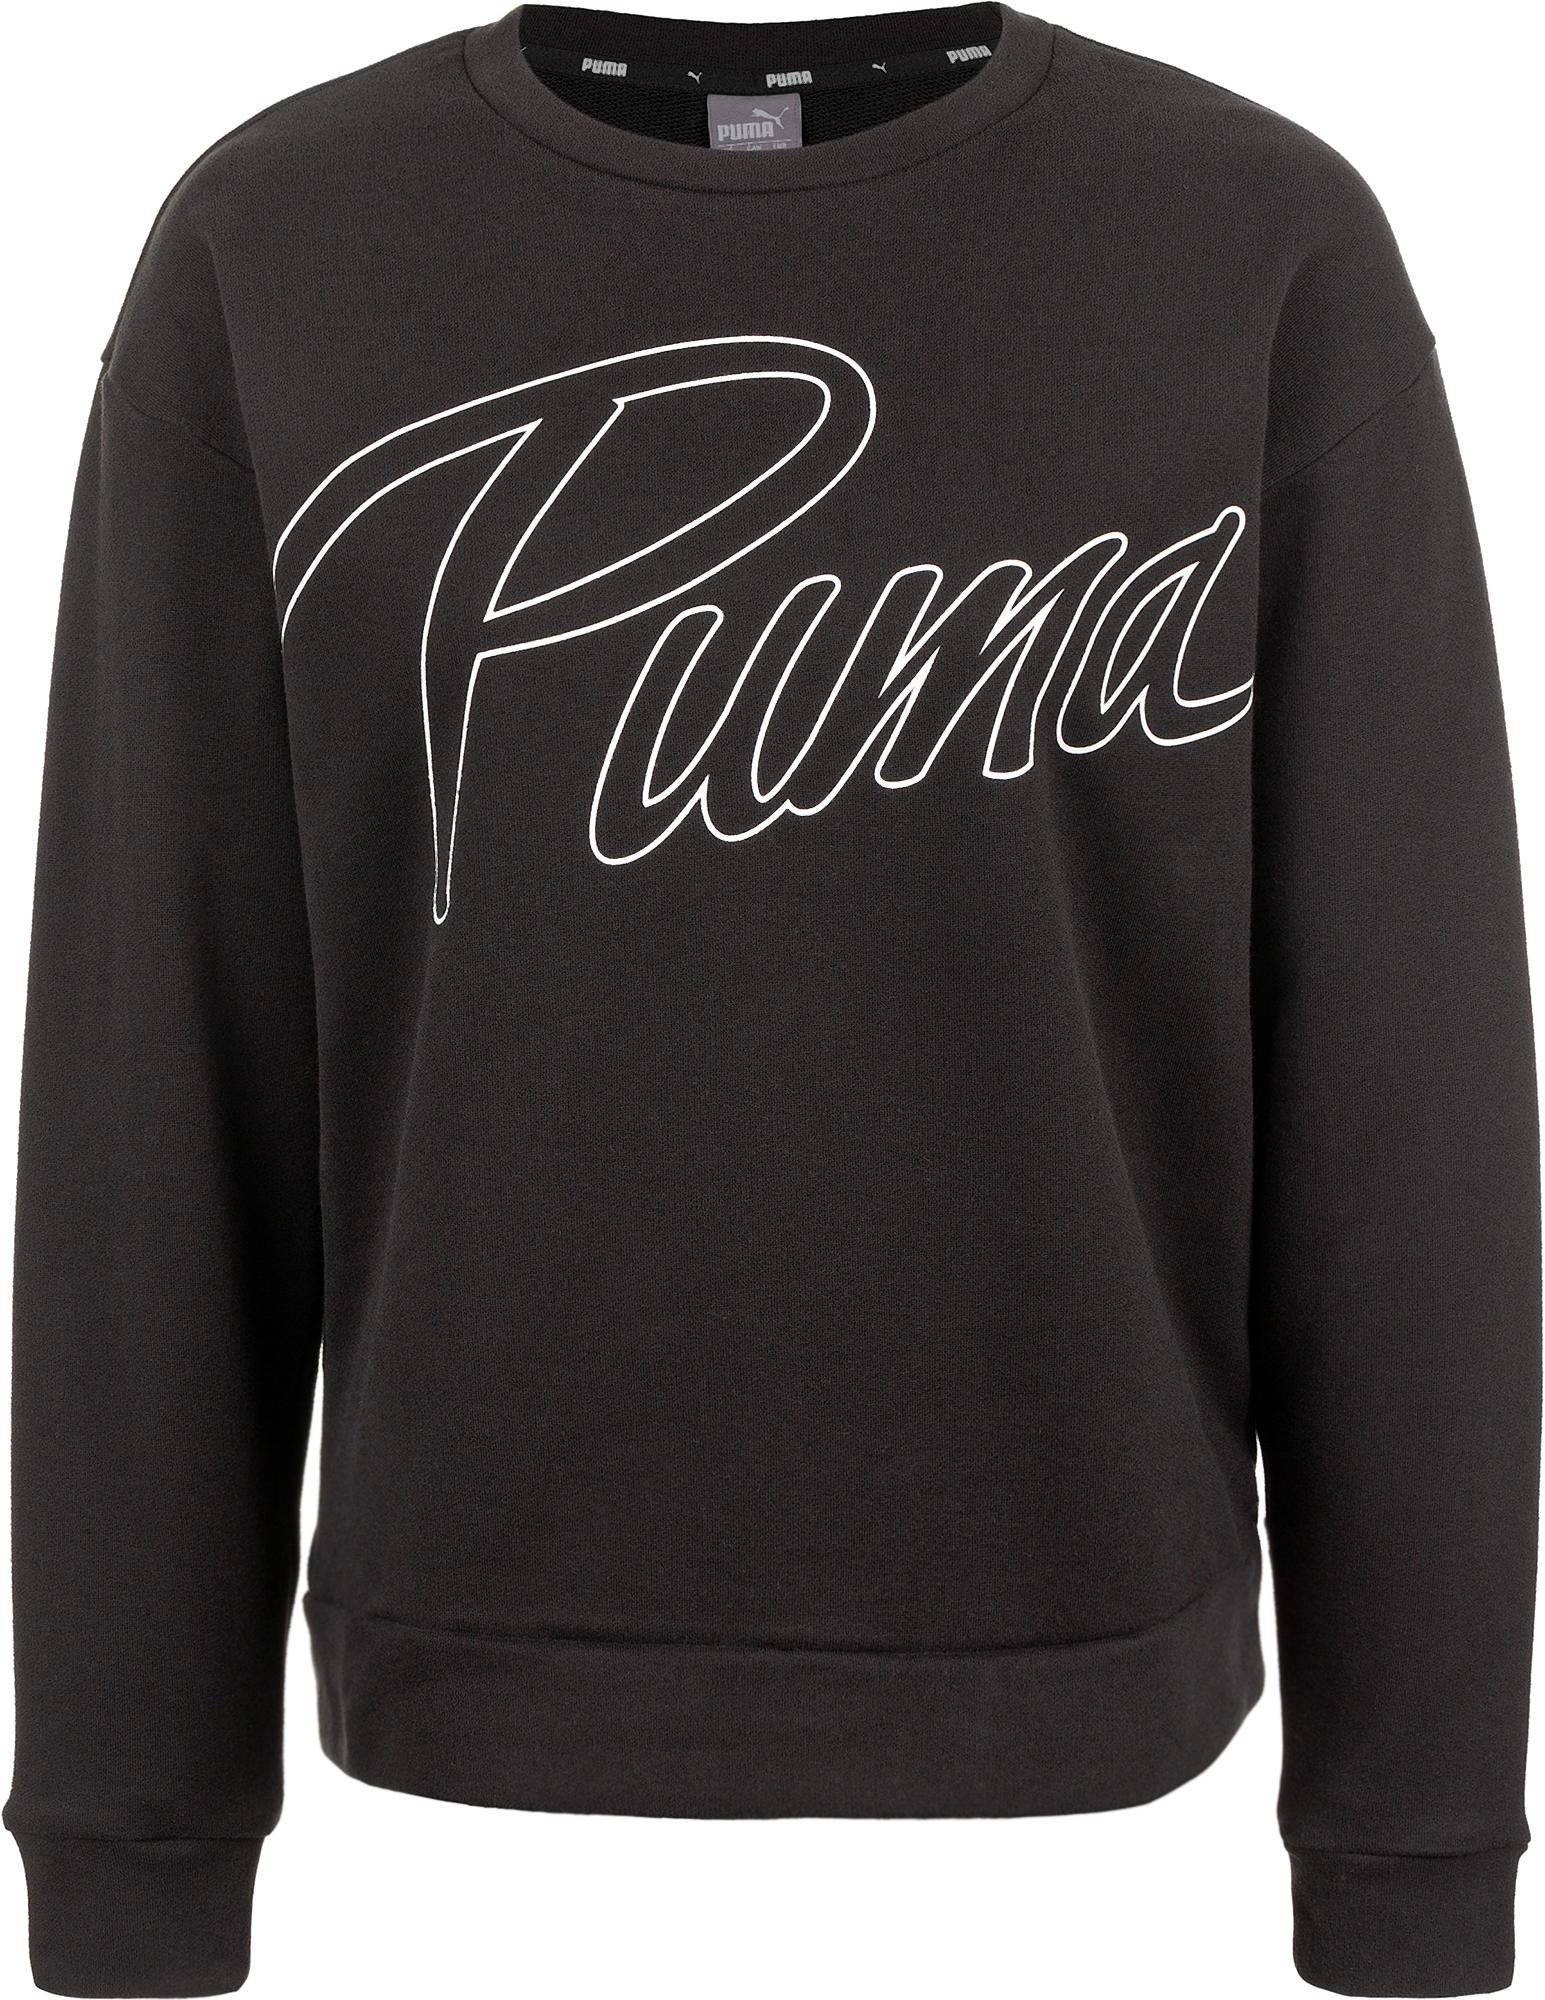 пуховик женский puma 70 30 480 down jacket цвет молочный 85166611 размер m 44 46 Puma Свитшот женский Puma Athletics Crew, размер 44-46